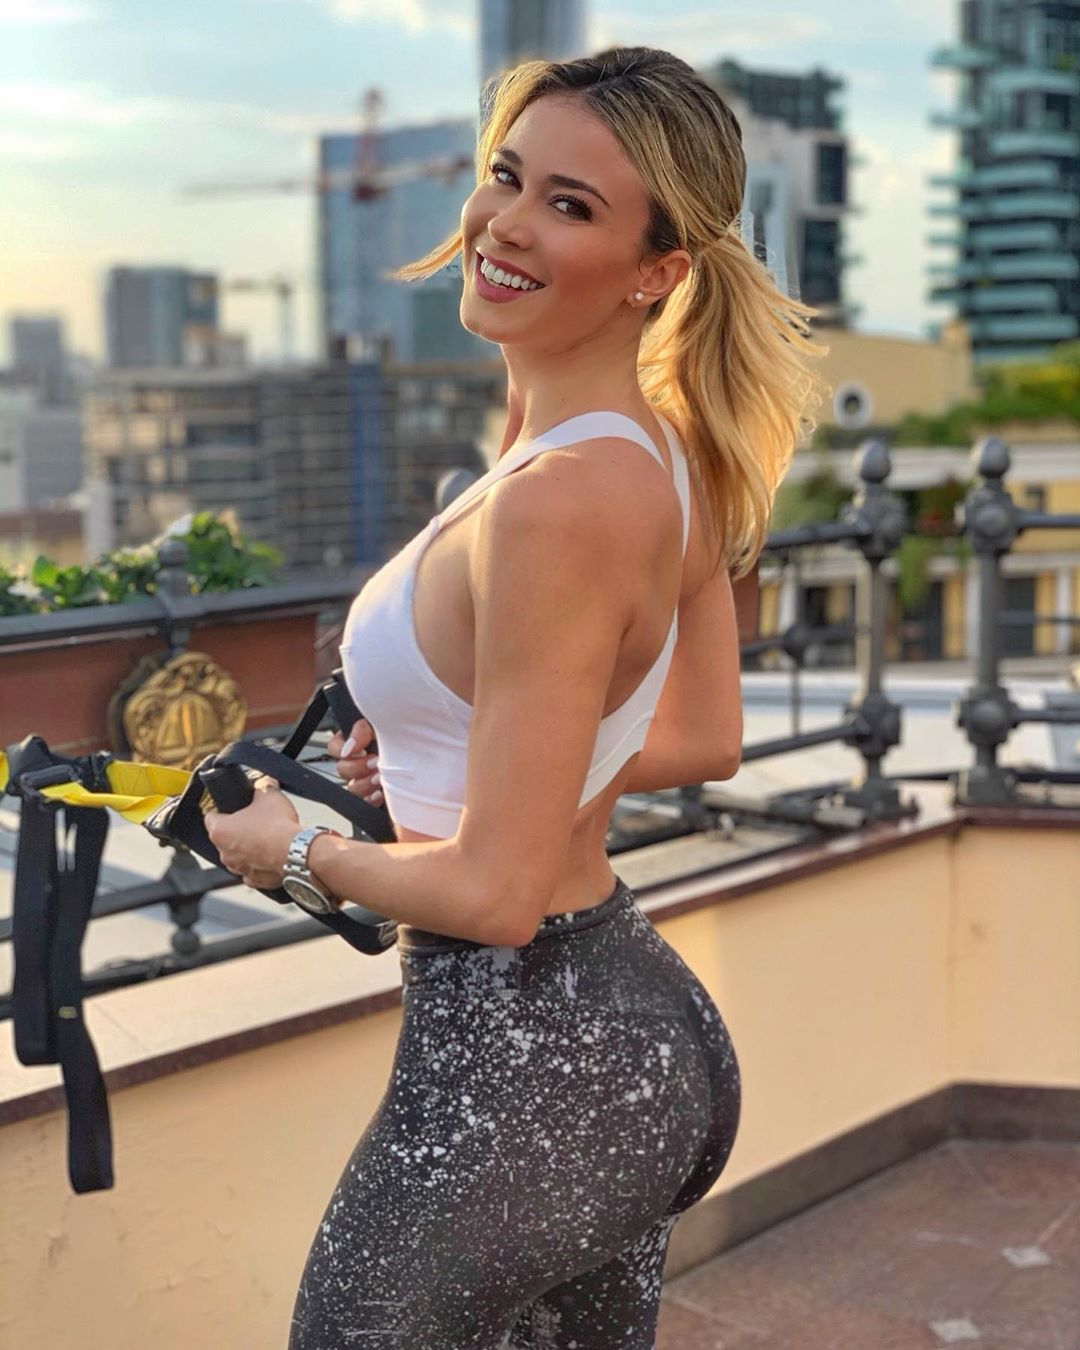 Porno leotta Diletta Leotta